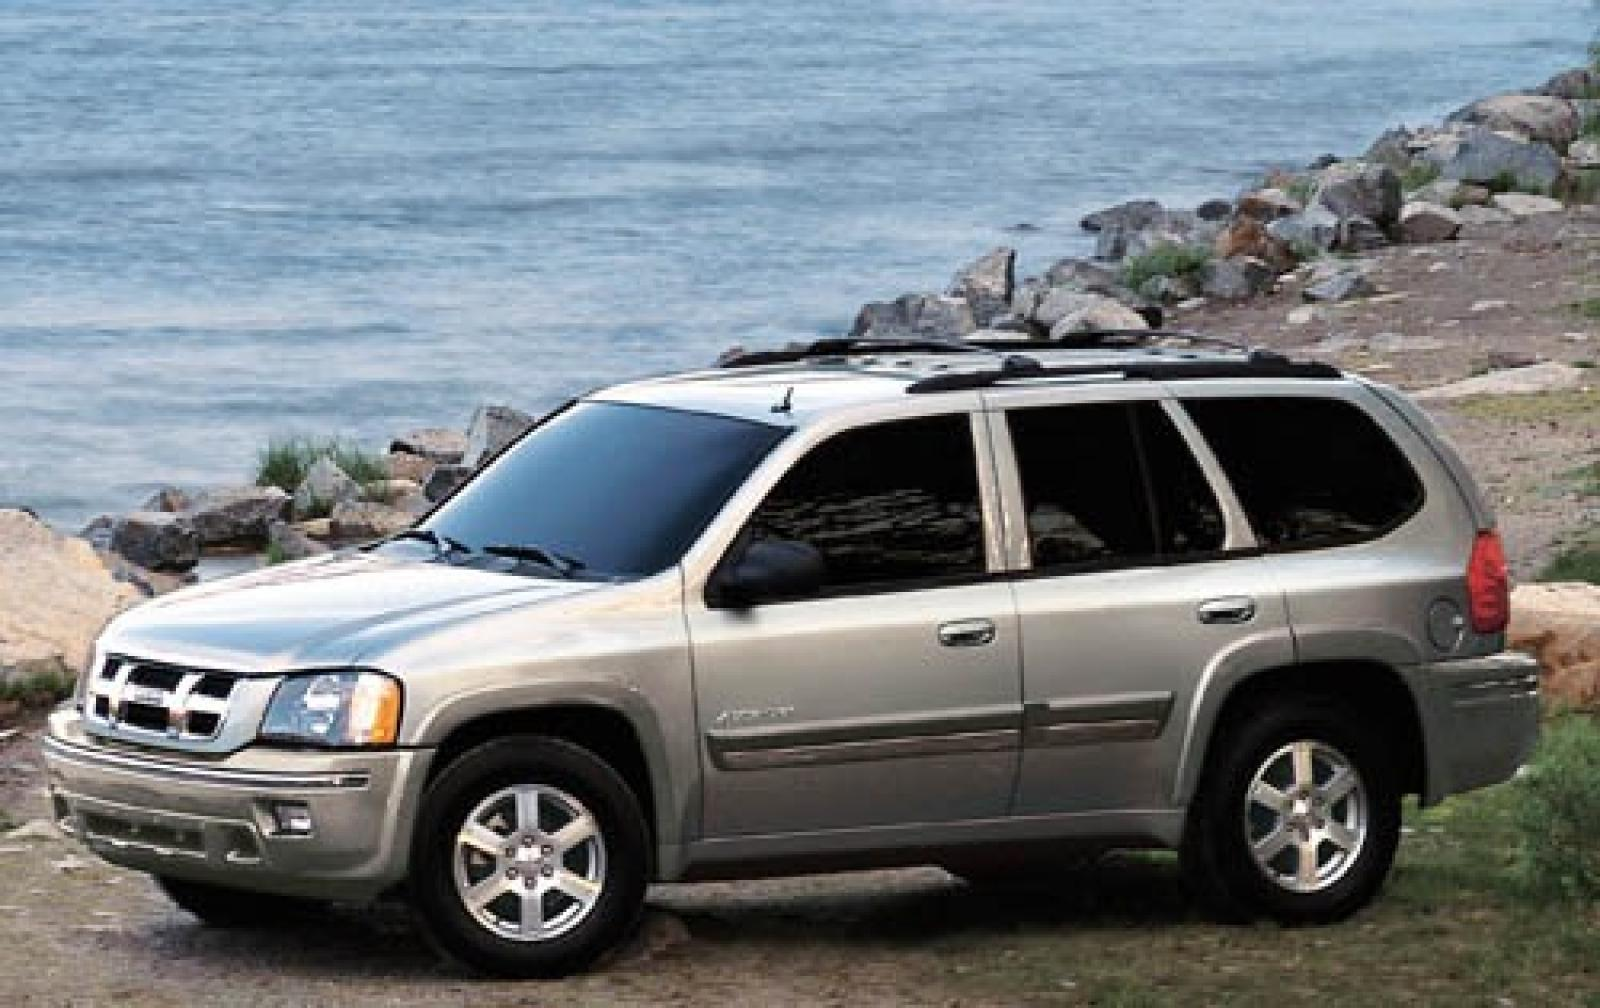 Isuzu Ascender 2002 - 2008 SUV 5 door #3